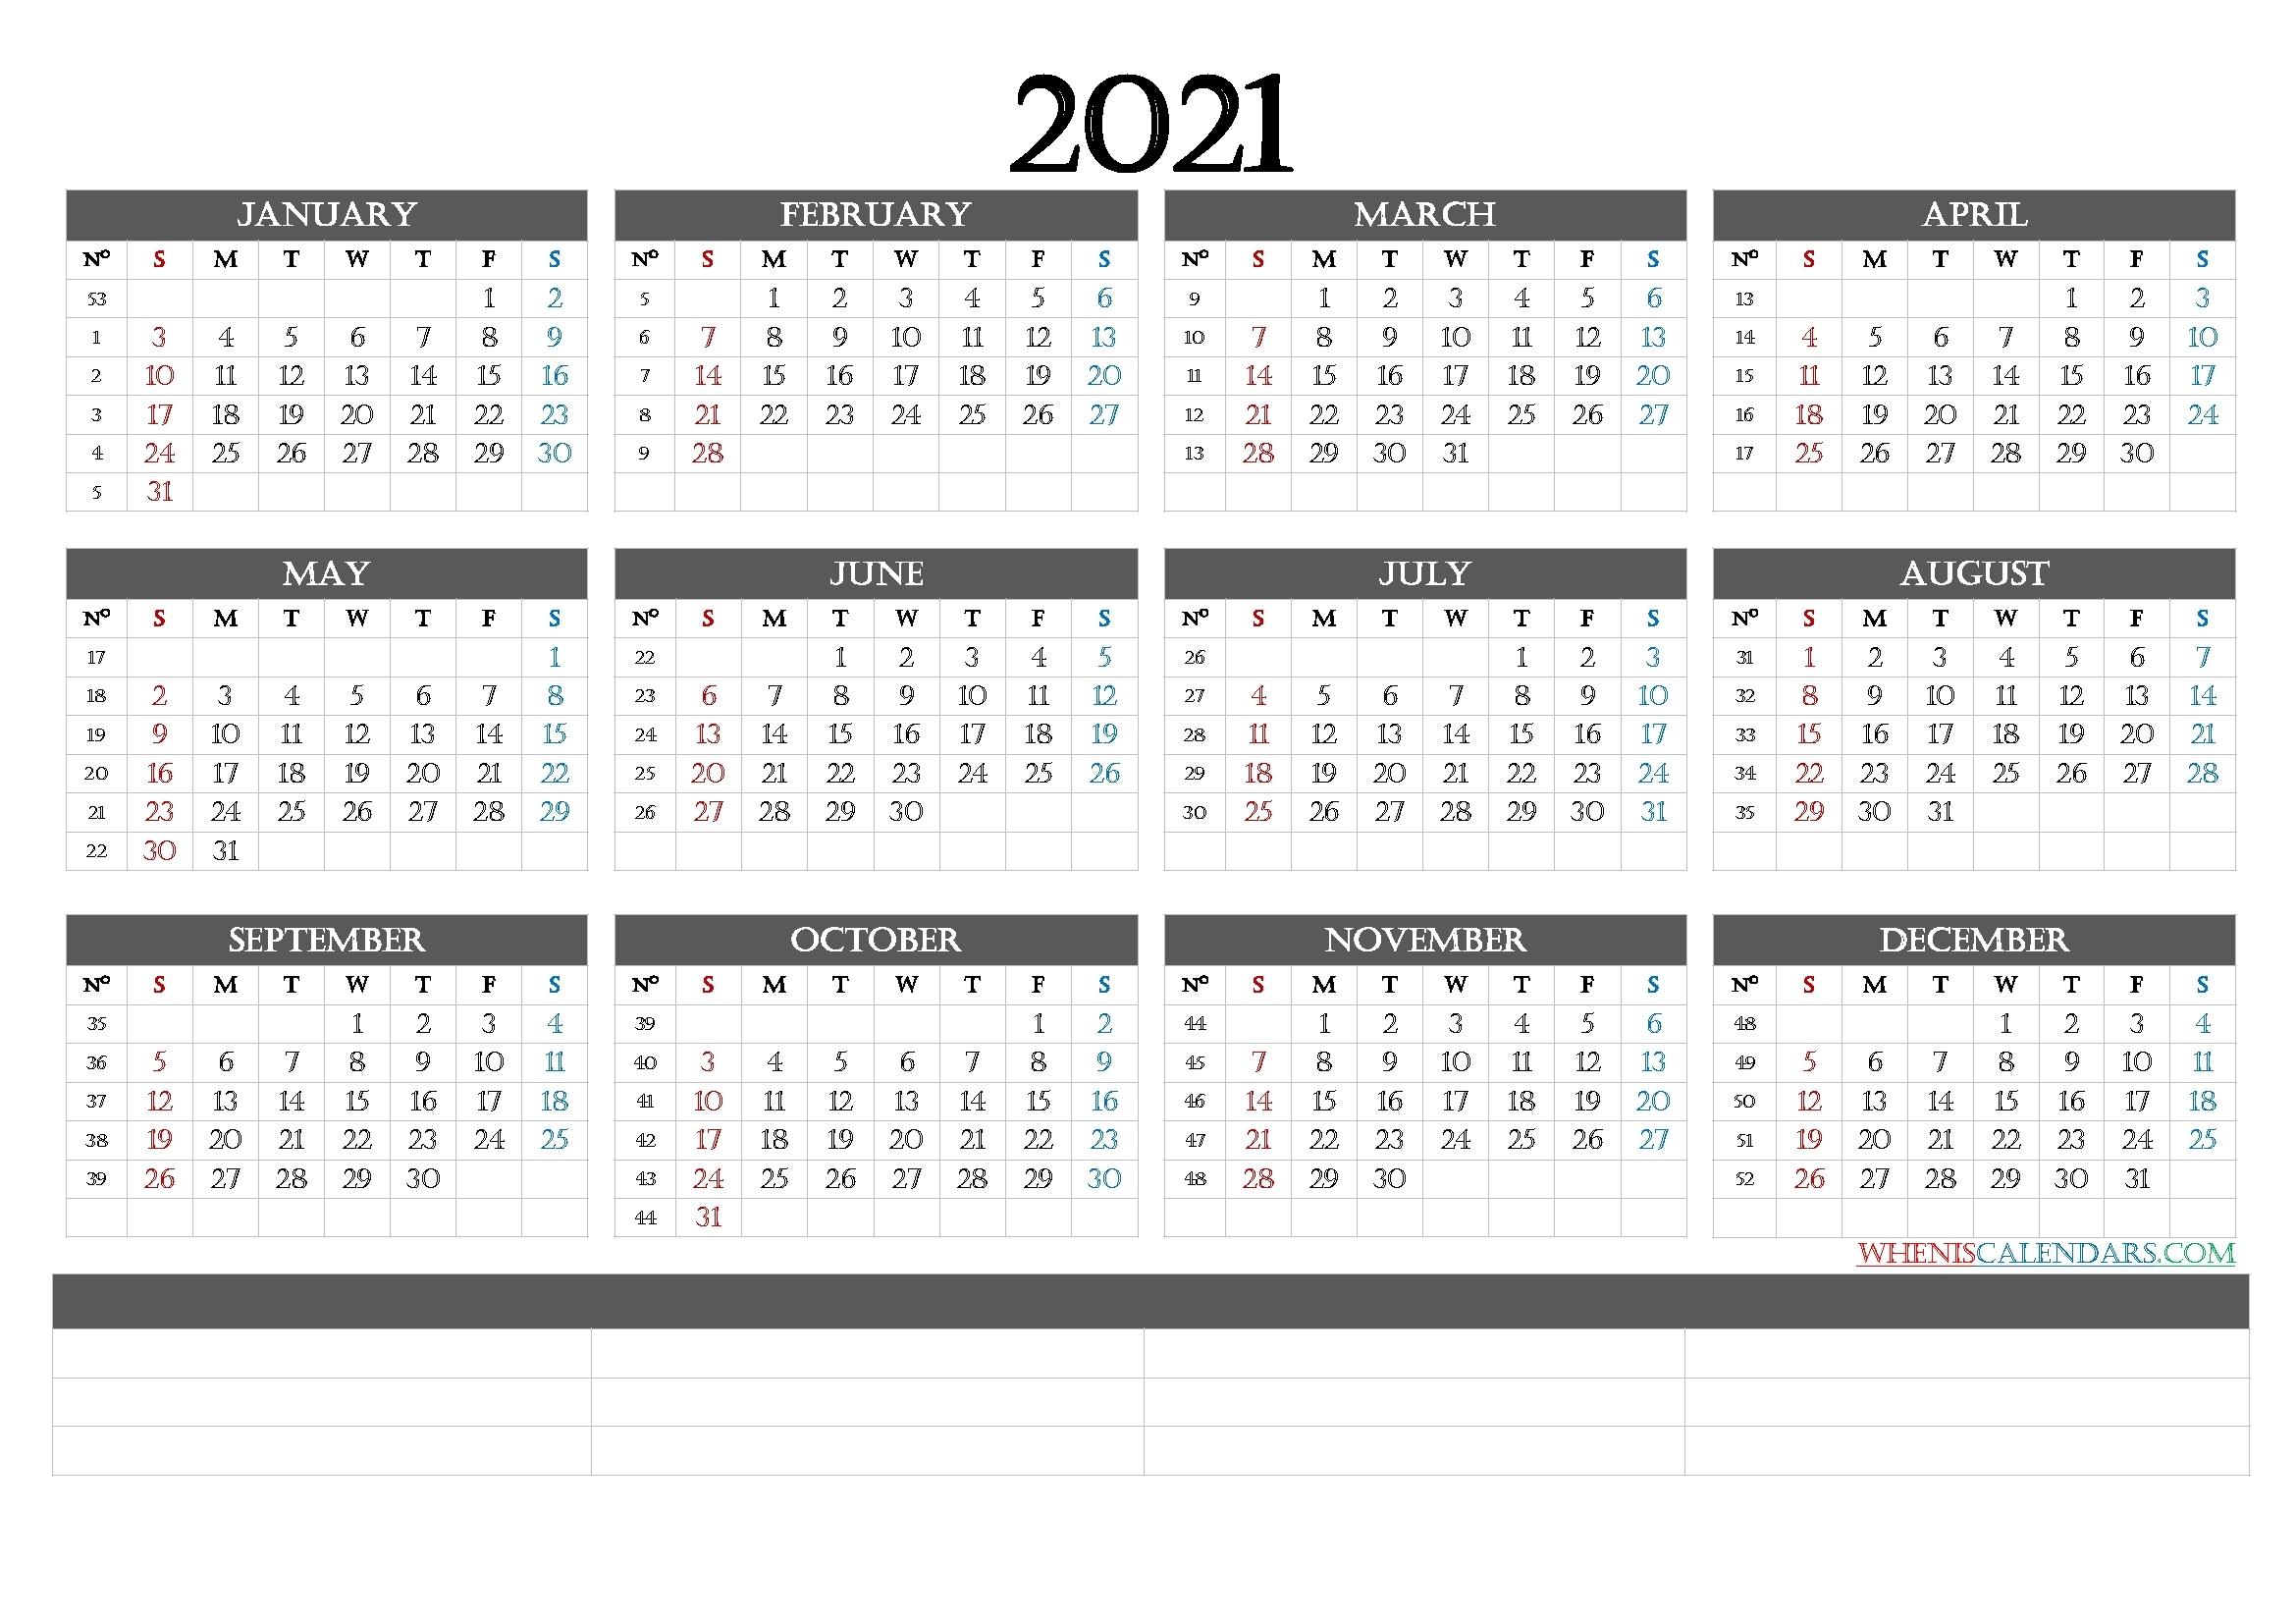 2021 Calendar With Week Numbers Printable (6 Templates) - Free Printable 2020 Monthly Calendar